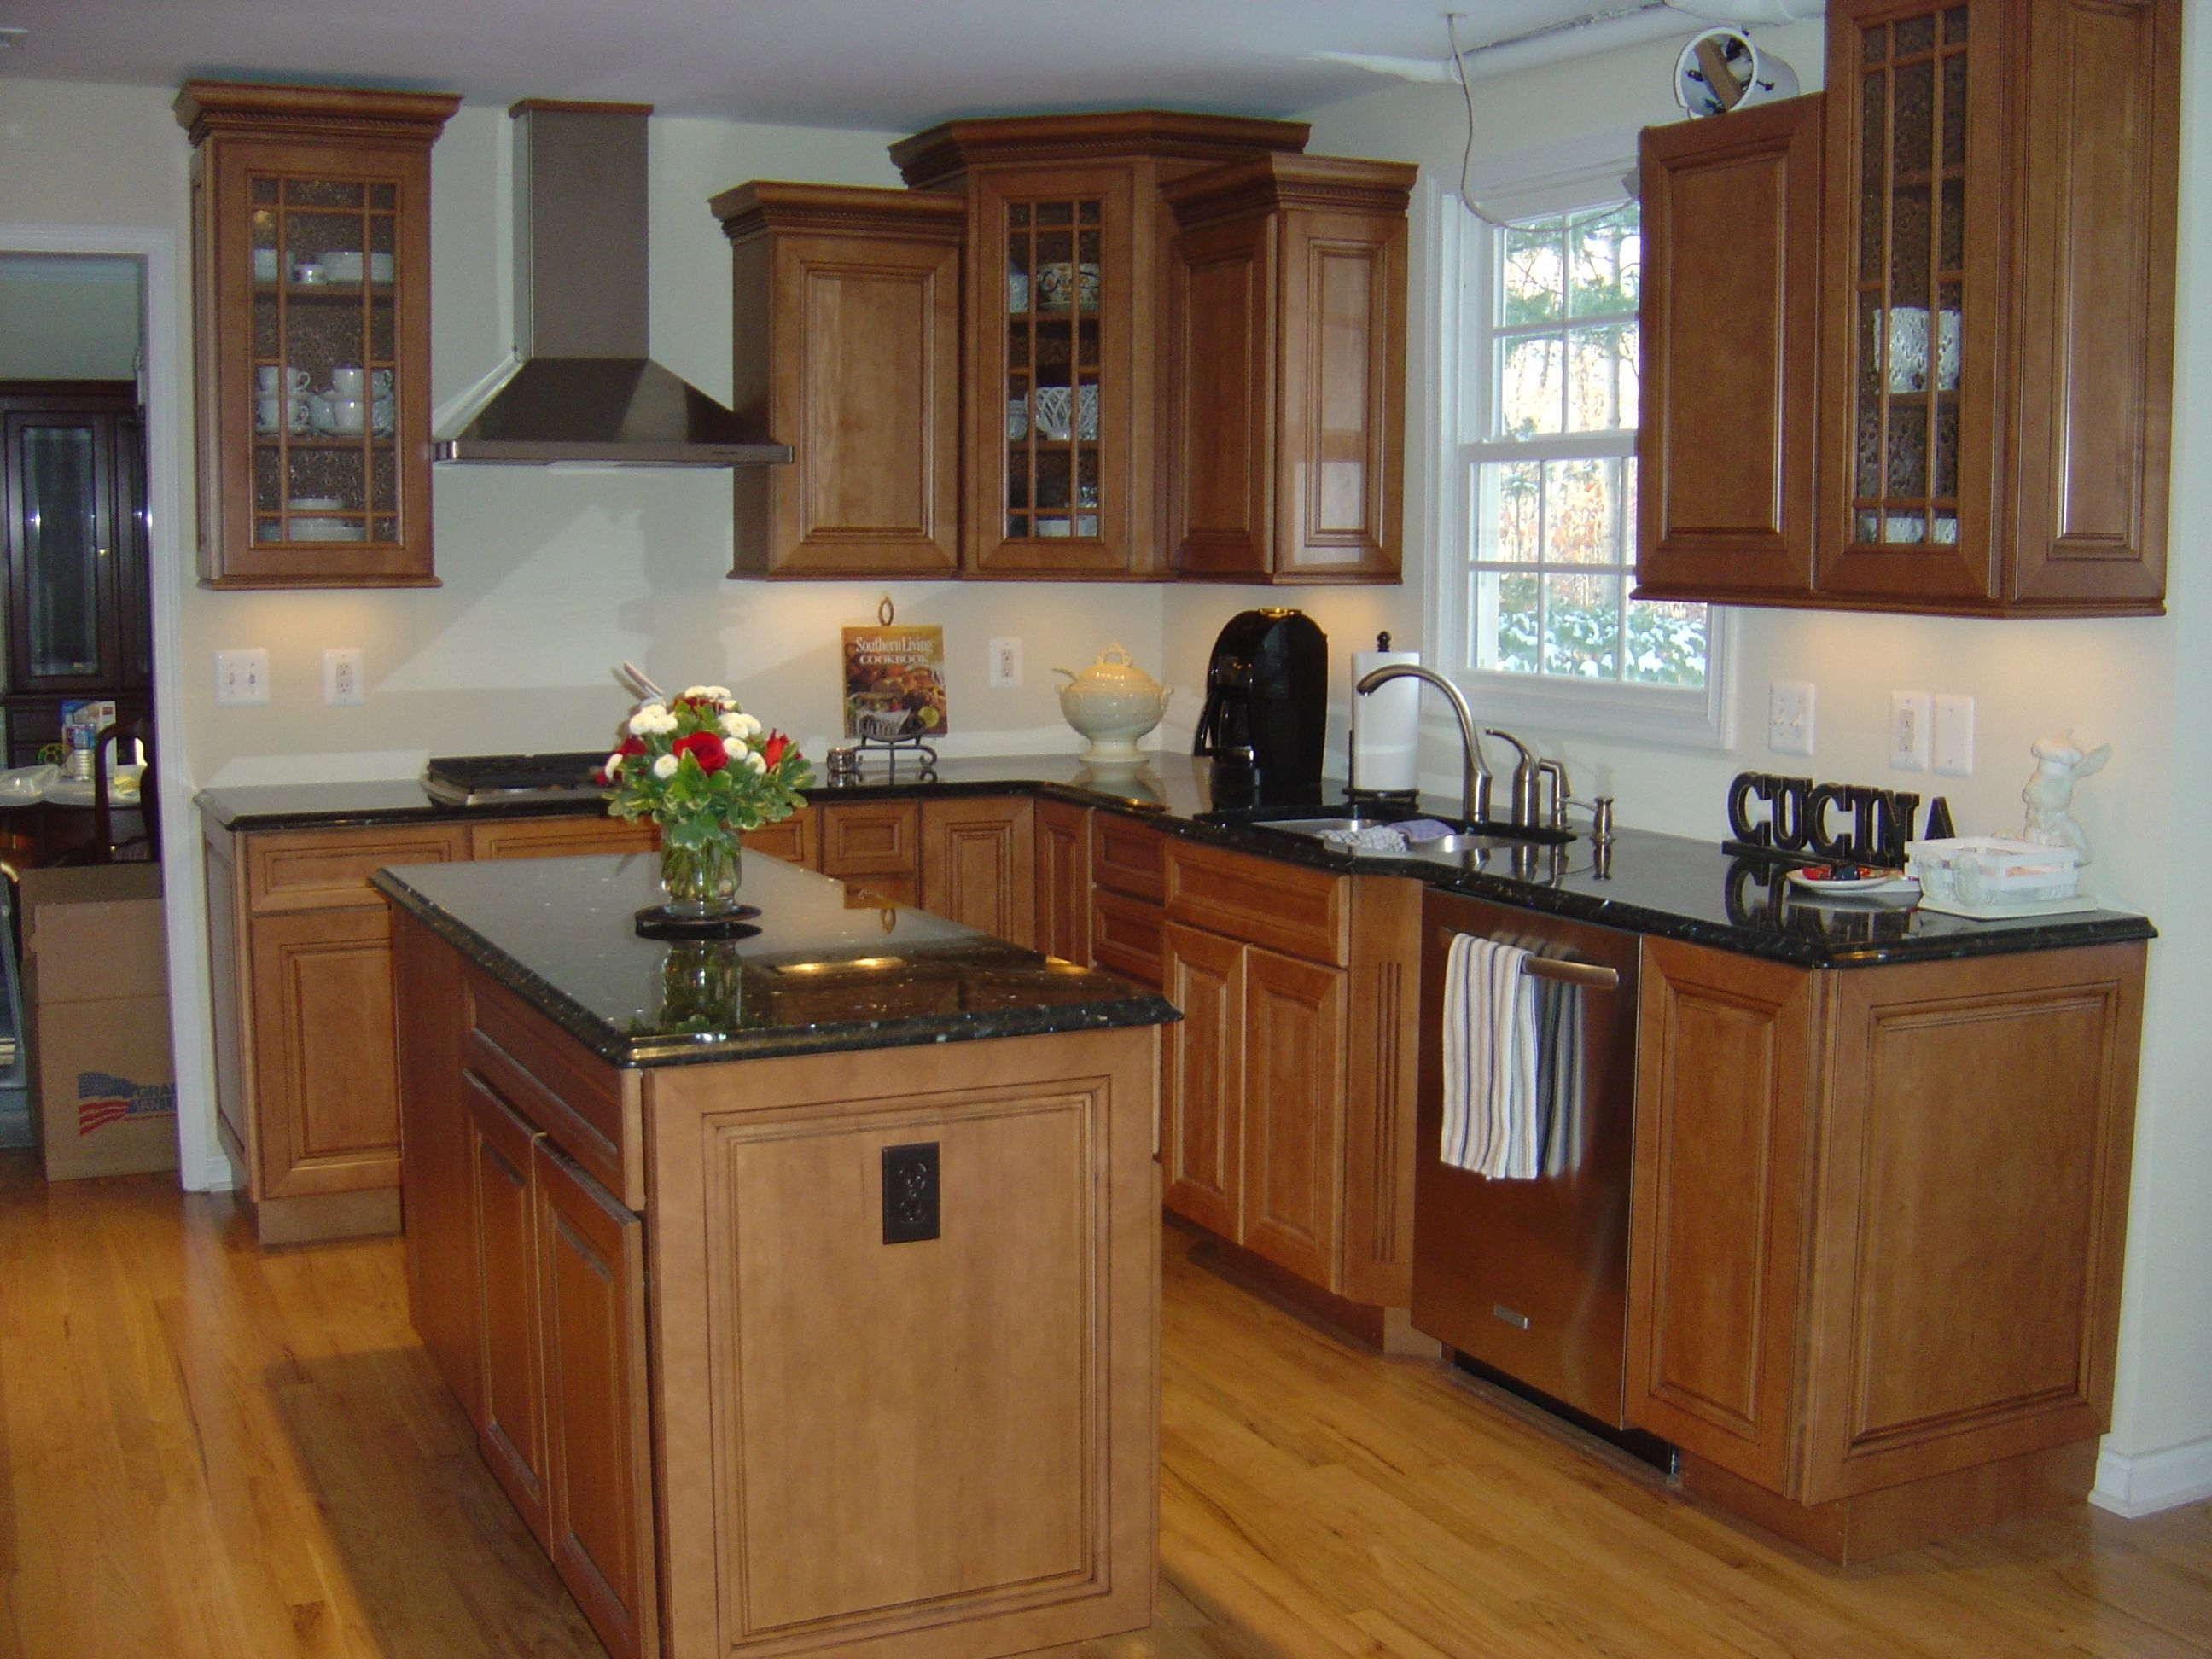 Light Wood Kitchen Cabinets With Dark Countertops ... on Countertops With Maple Cabinets  id=95358